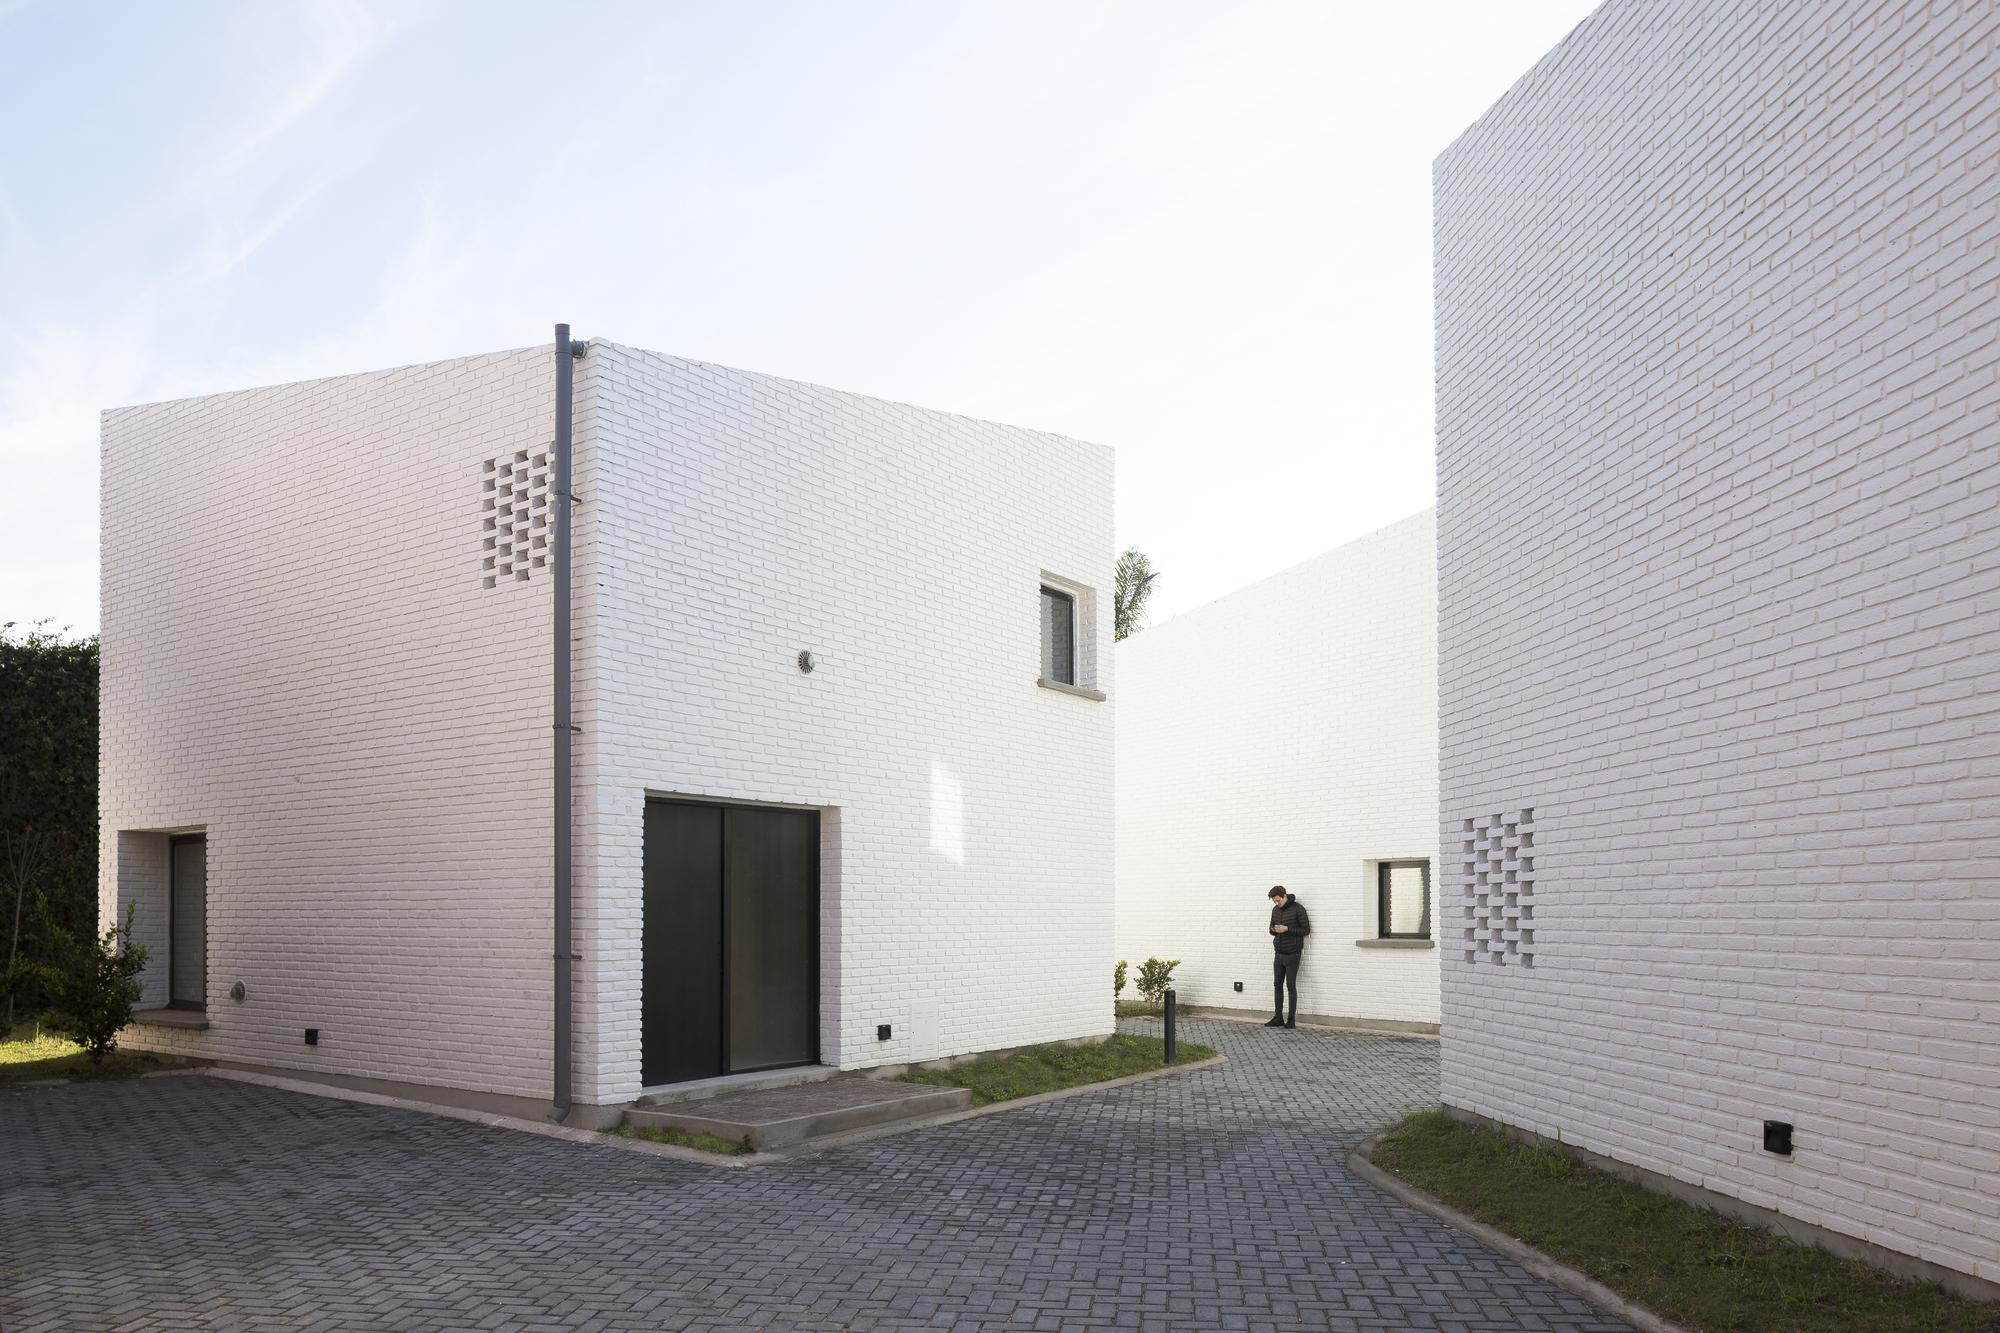 Morrison Building / BBOA - Balparda Brunel Oficina de Arquitectura